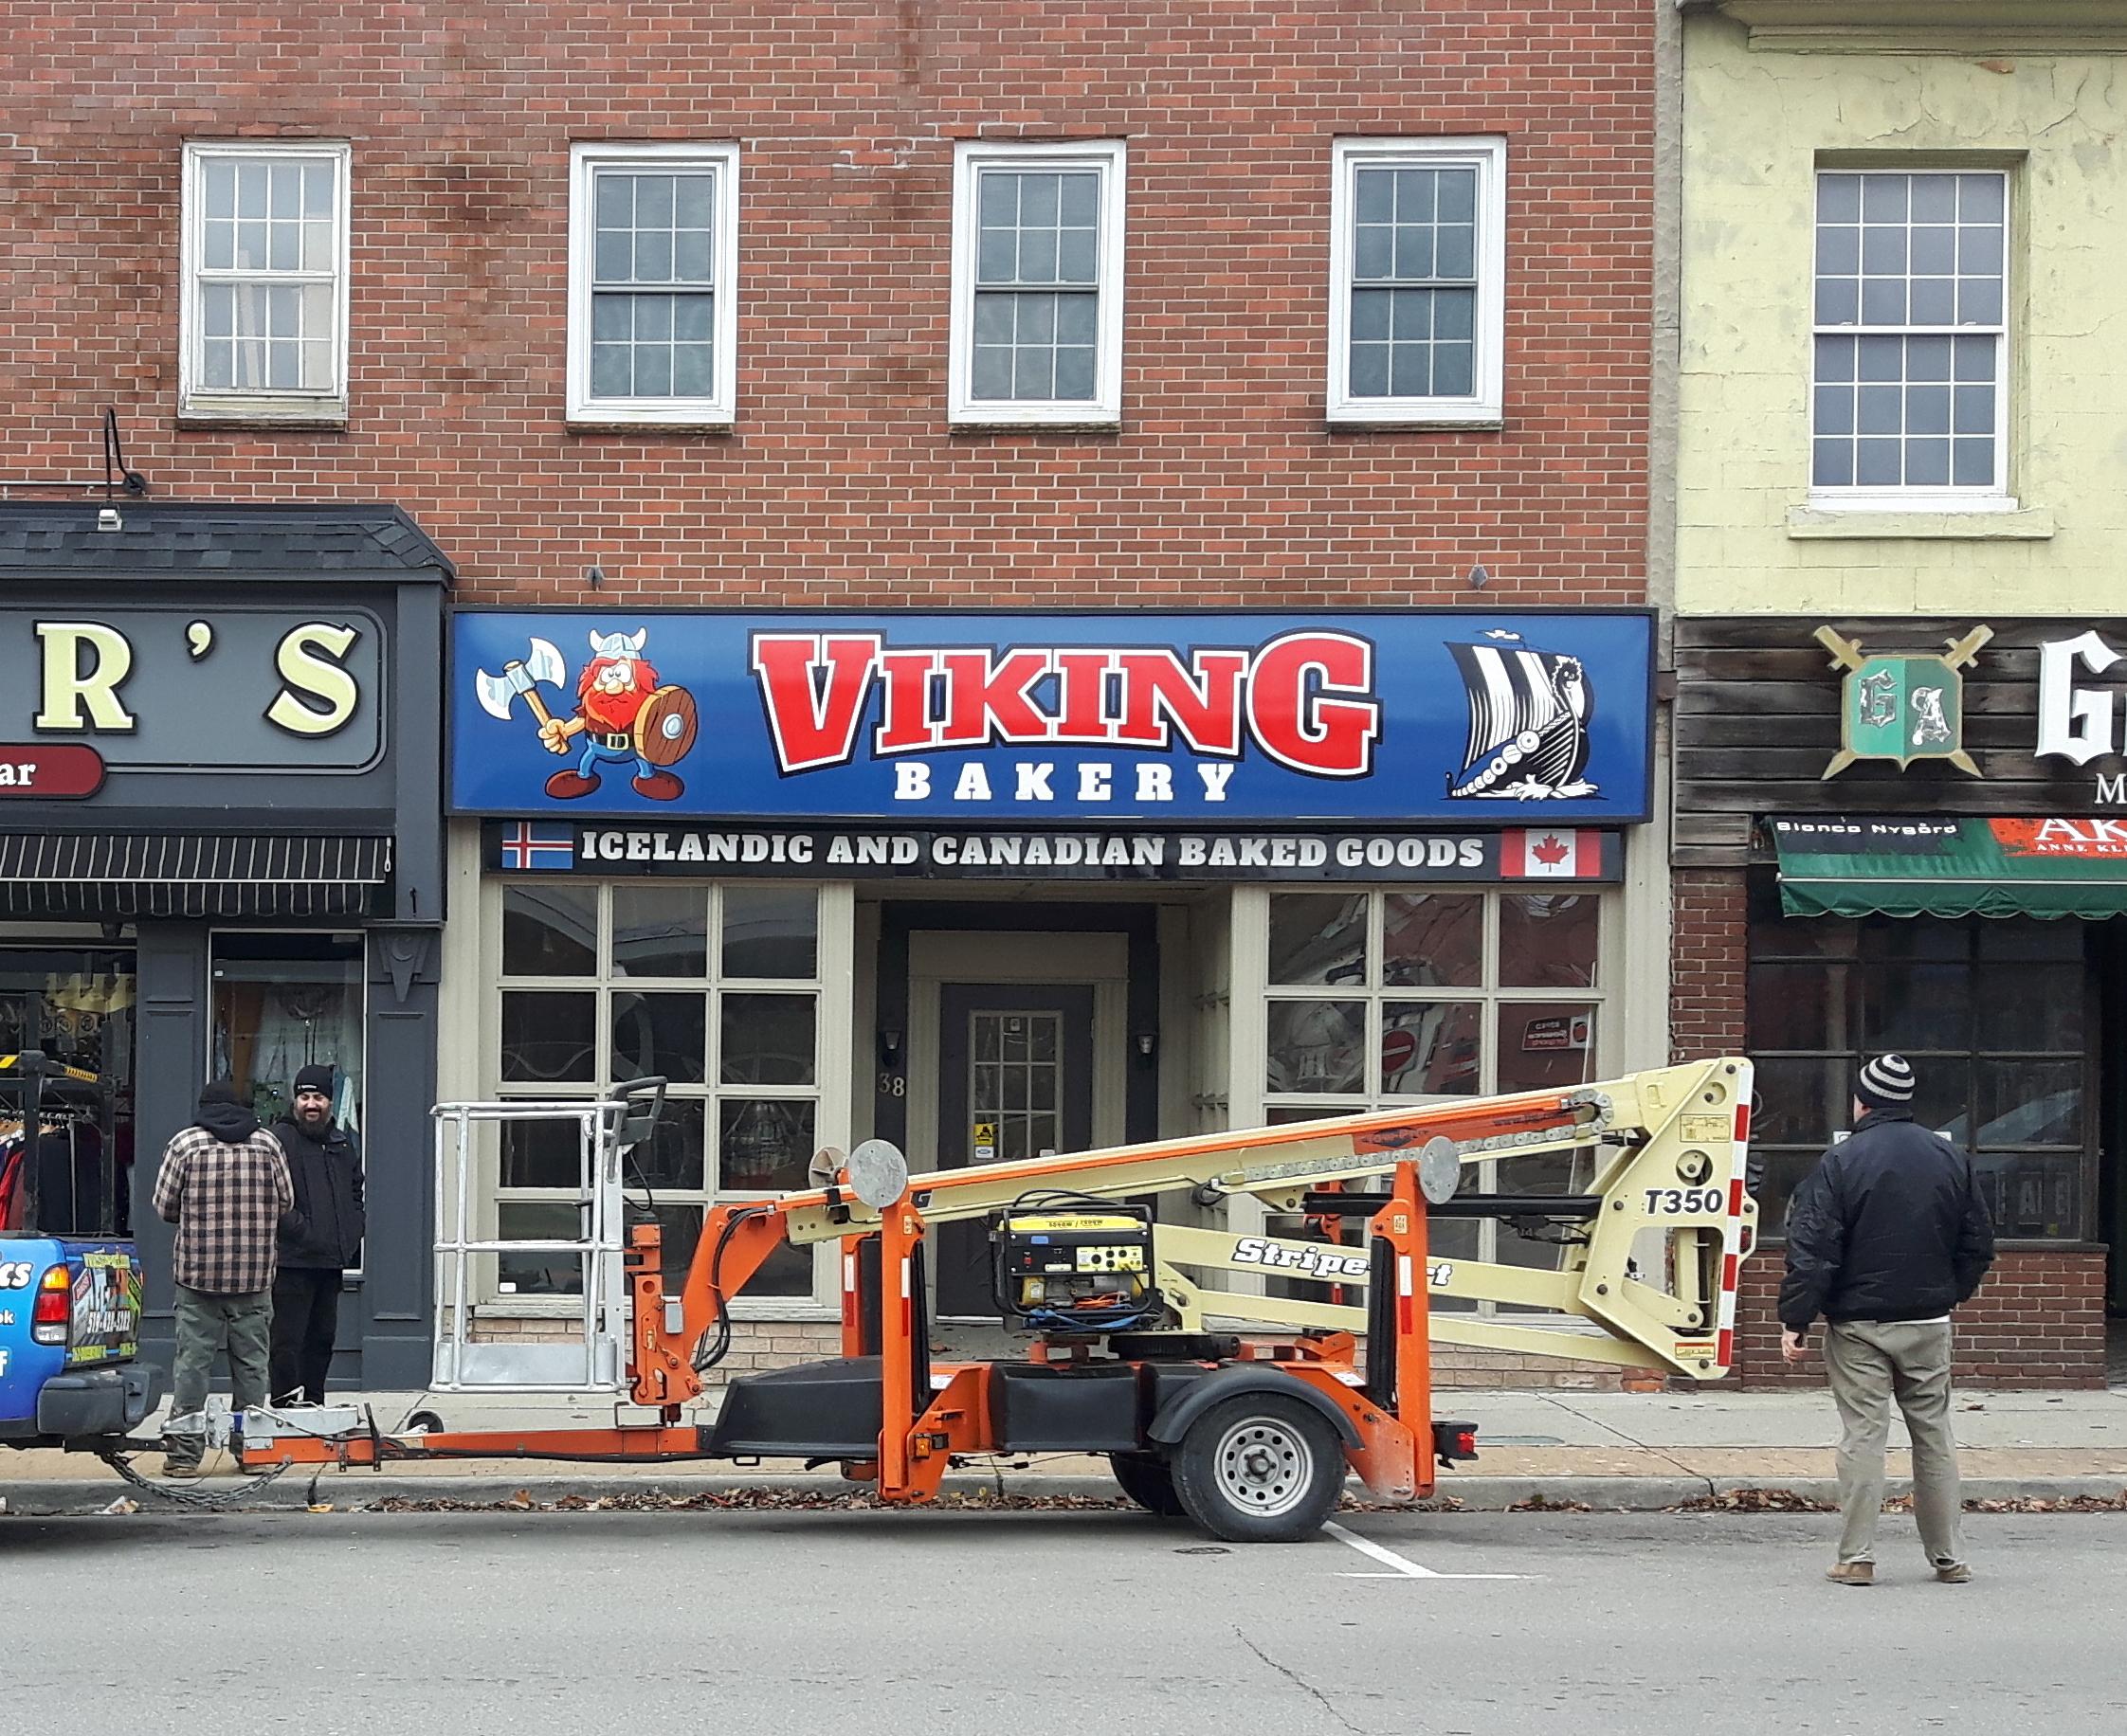 VikingBakery.jpg